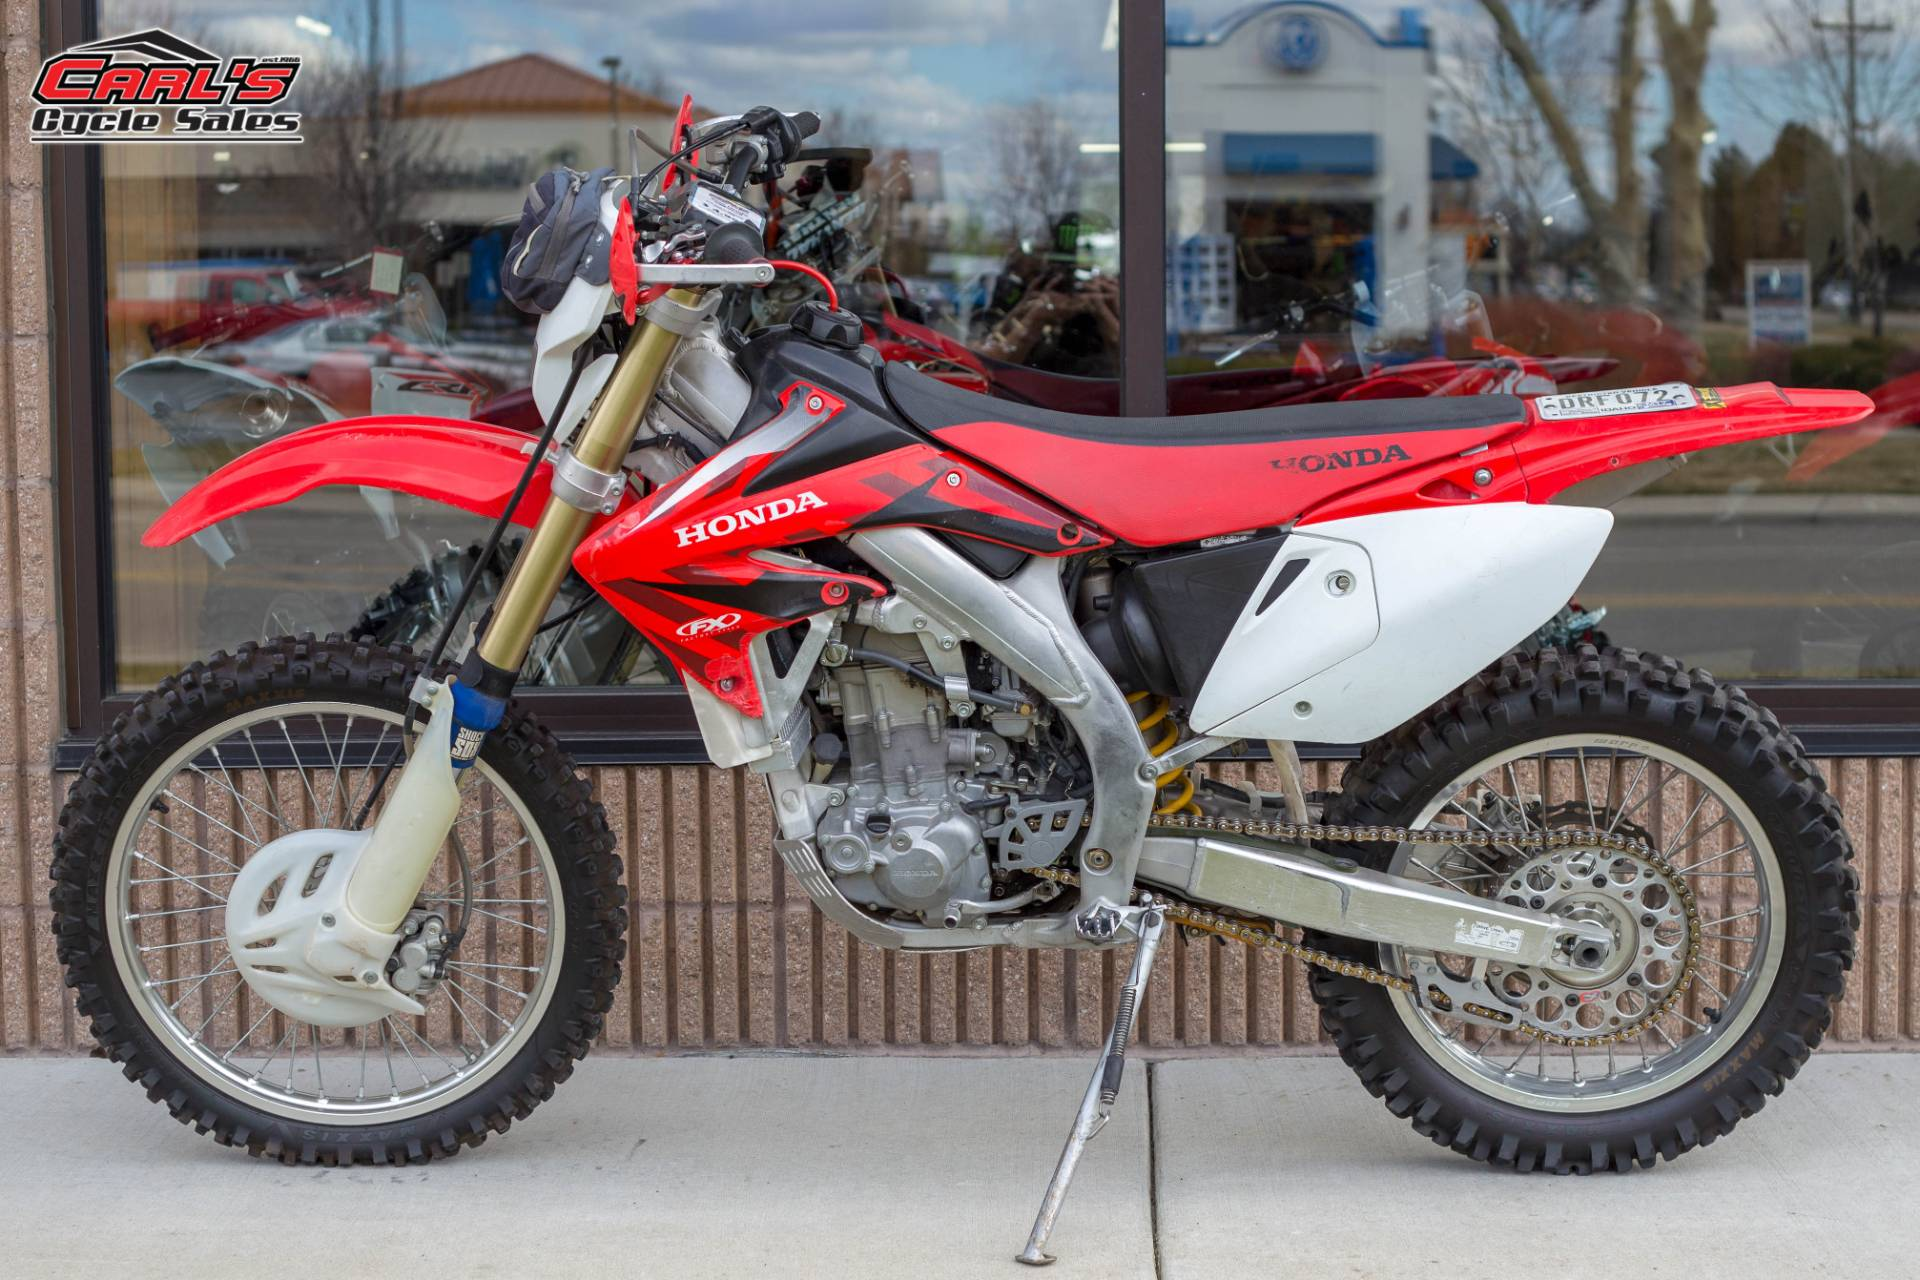 2005 CRF450X